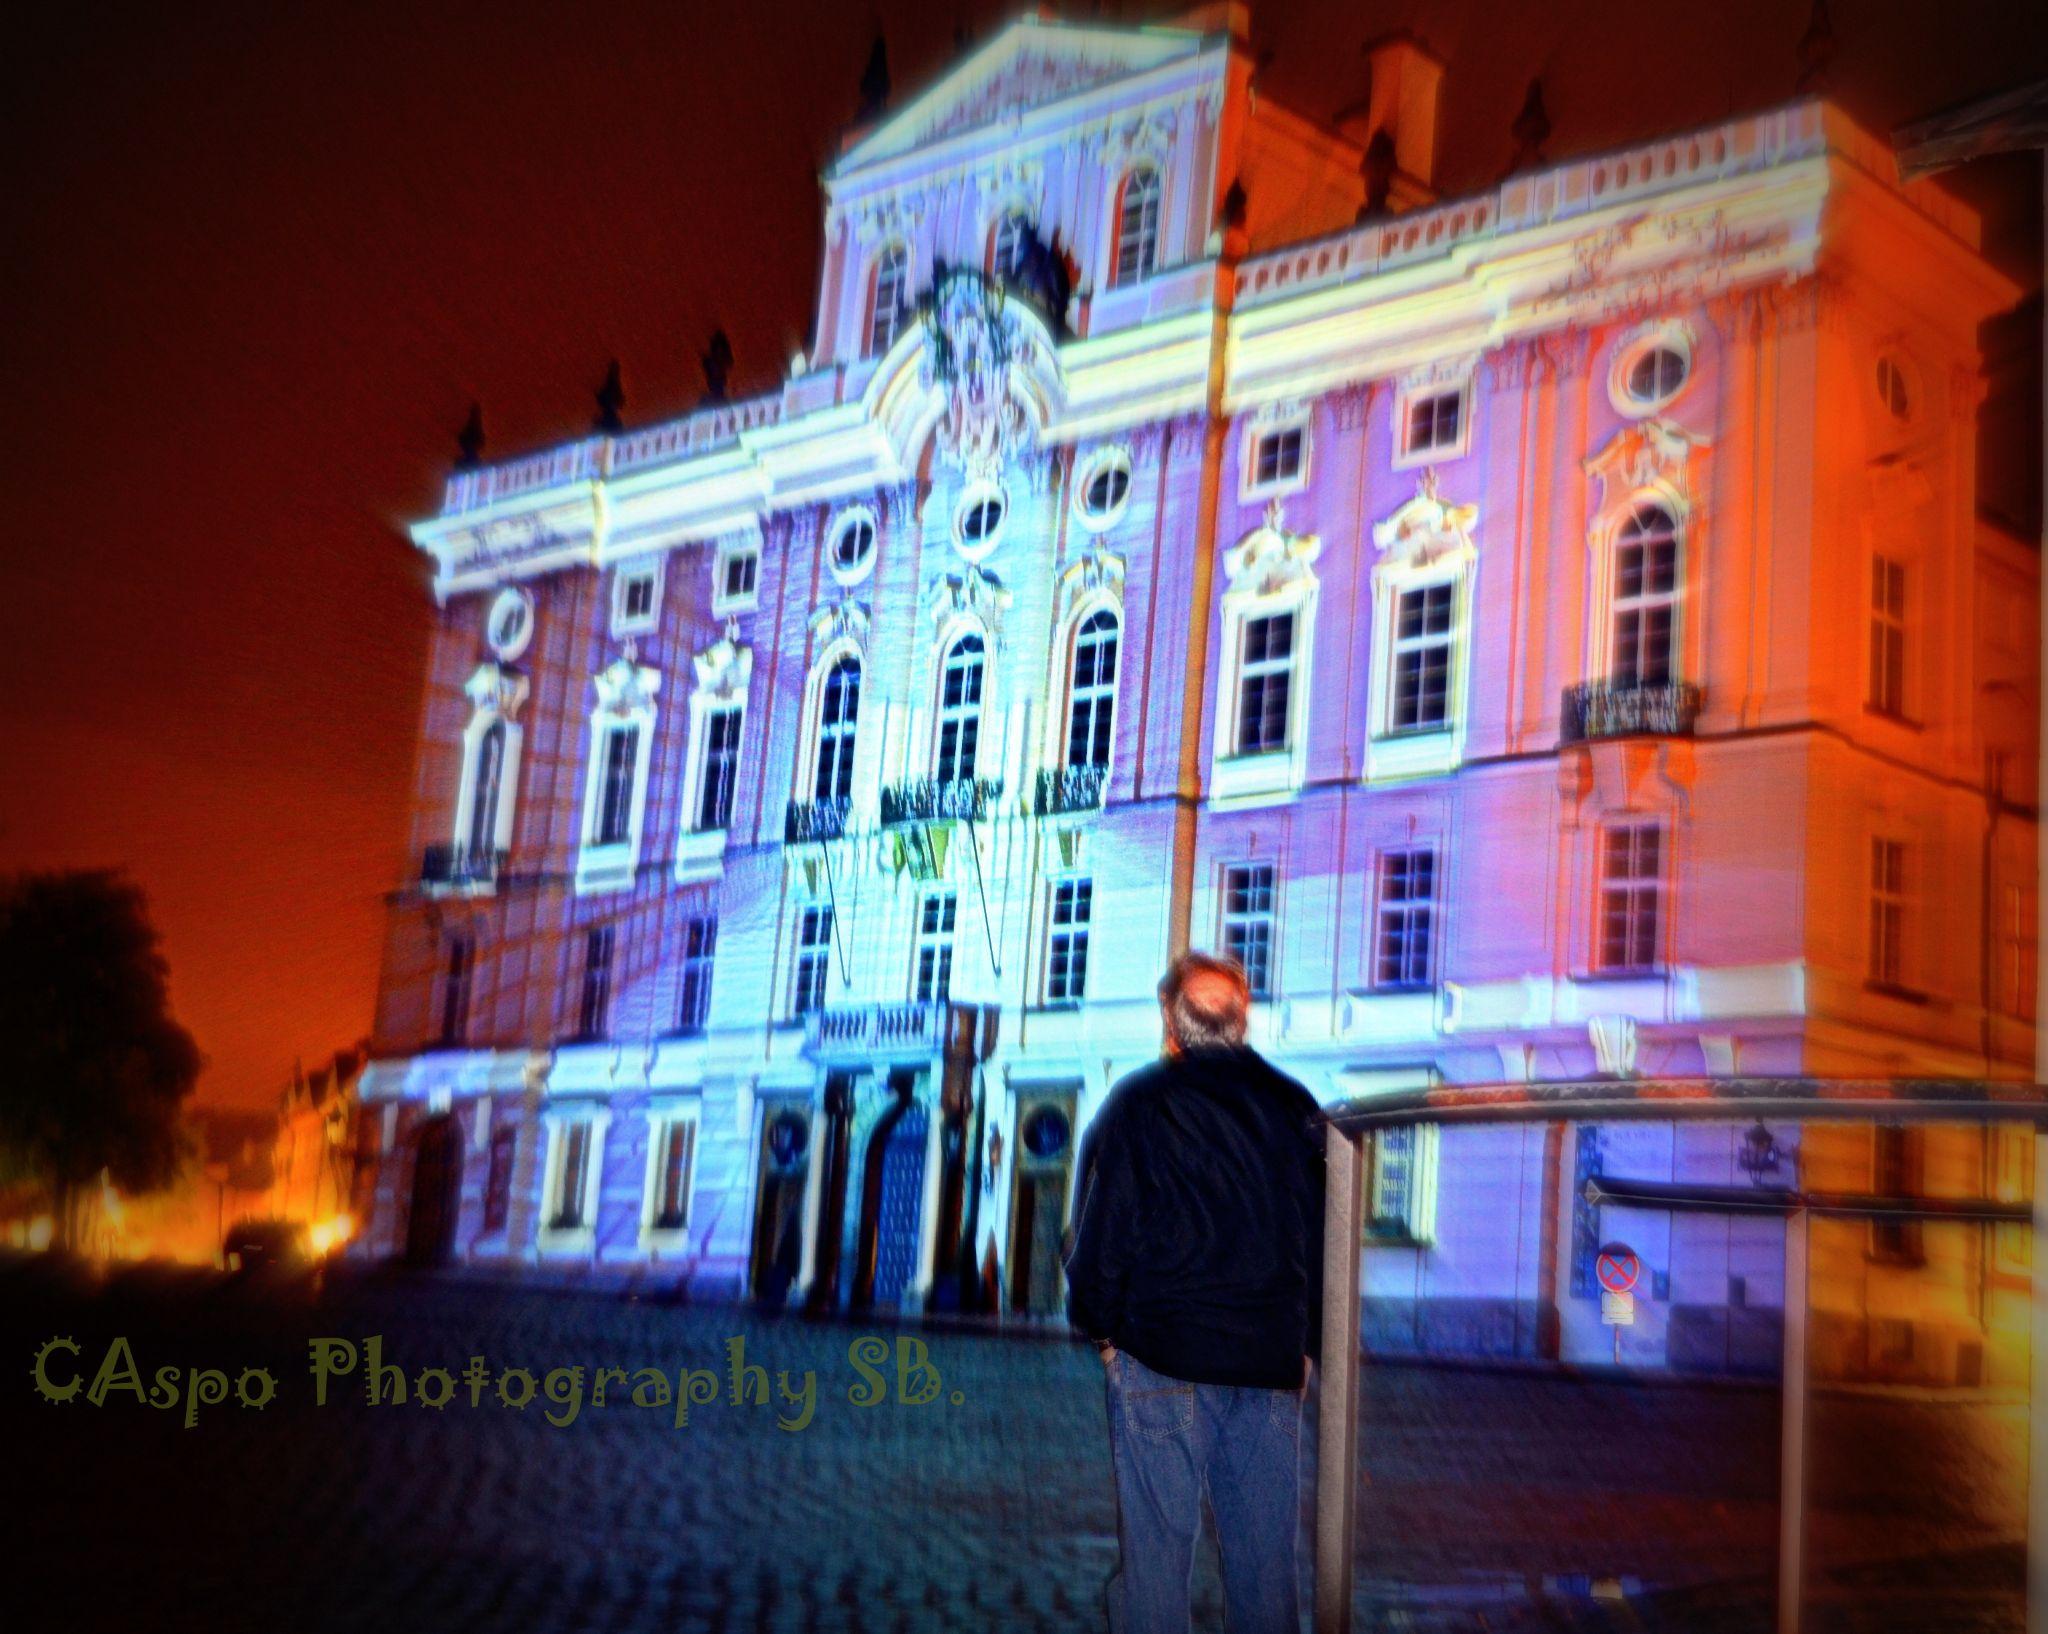 Castle by rastislavk1